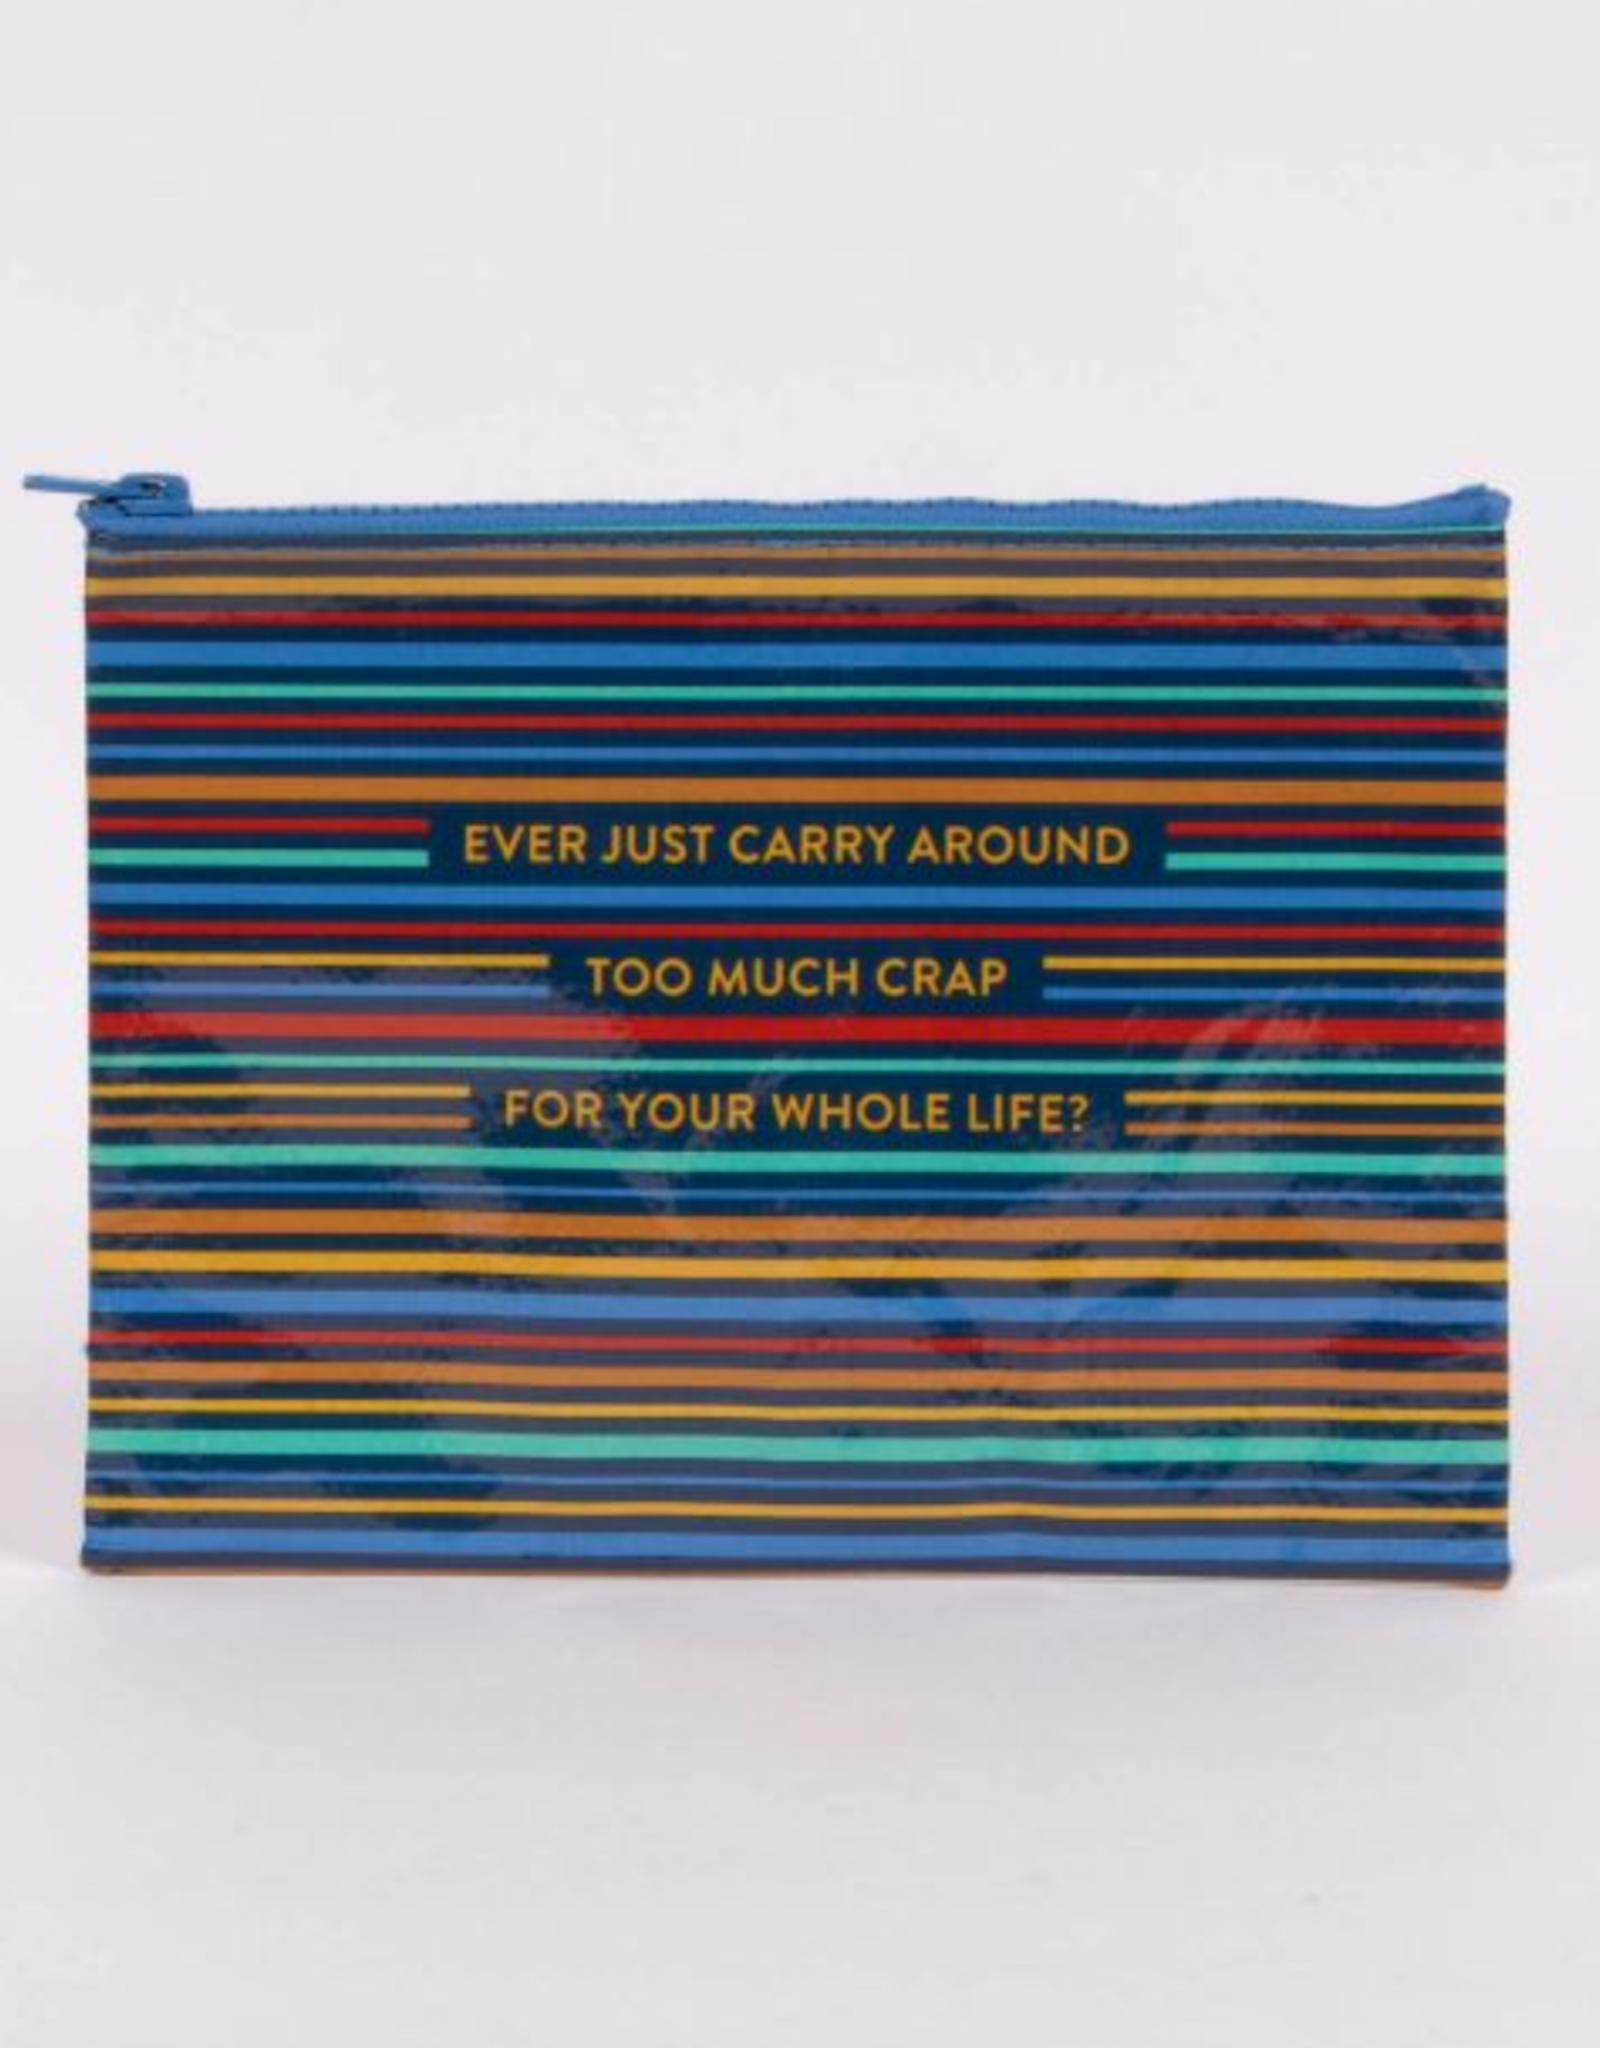 Blue Q Zipper Pouch carry Around Too Much Crap